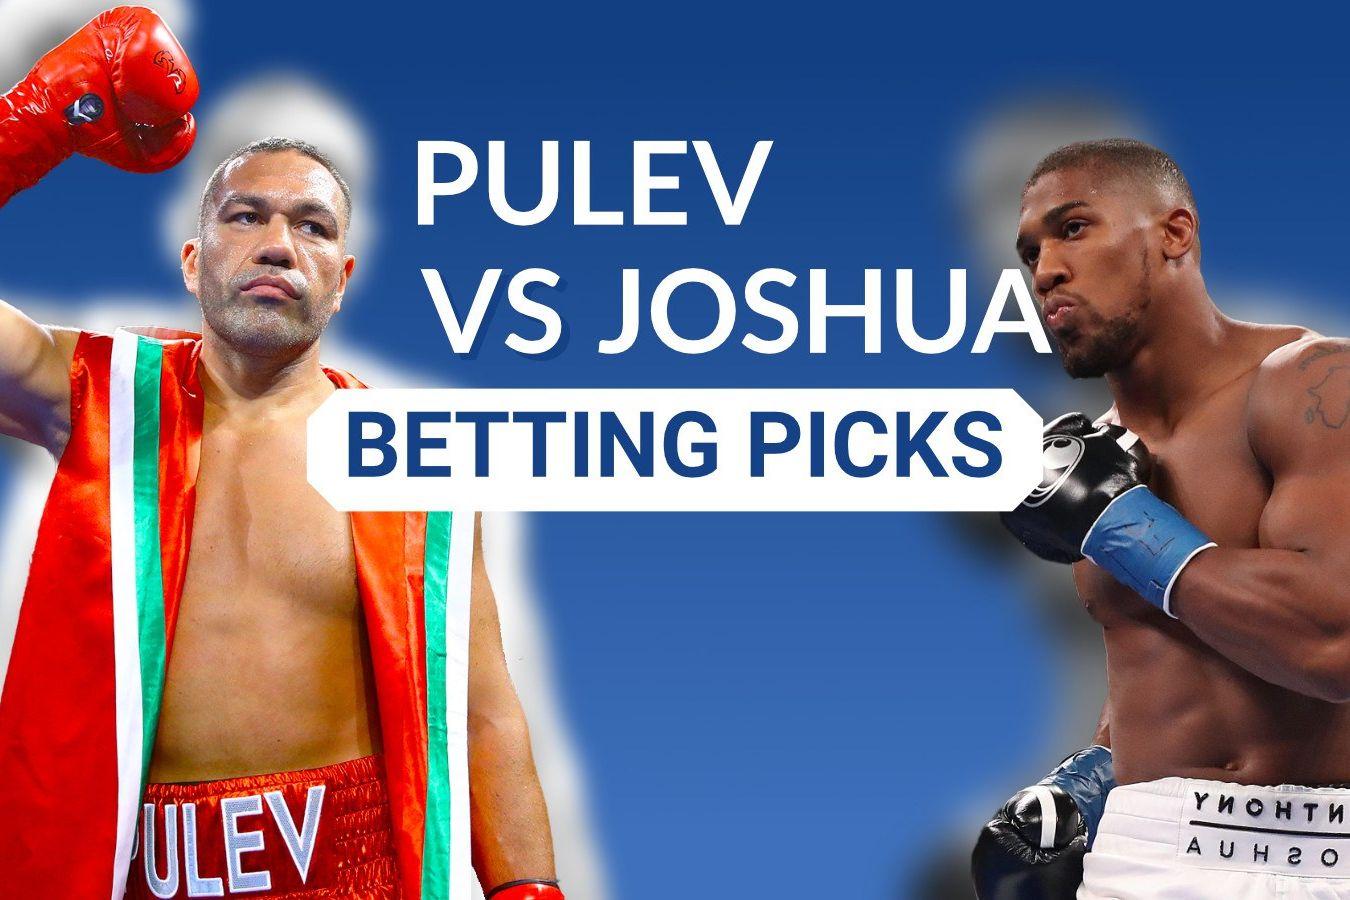 Joshua vs Pulev Betting Picks: Expect A Joshua Knockout